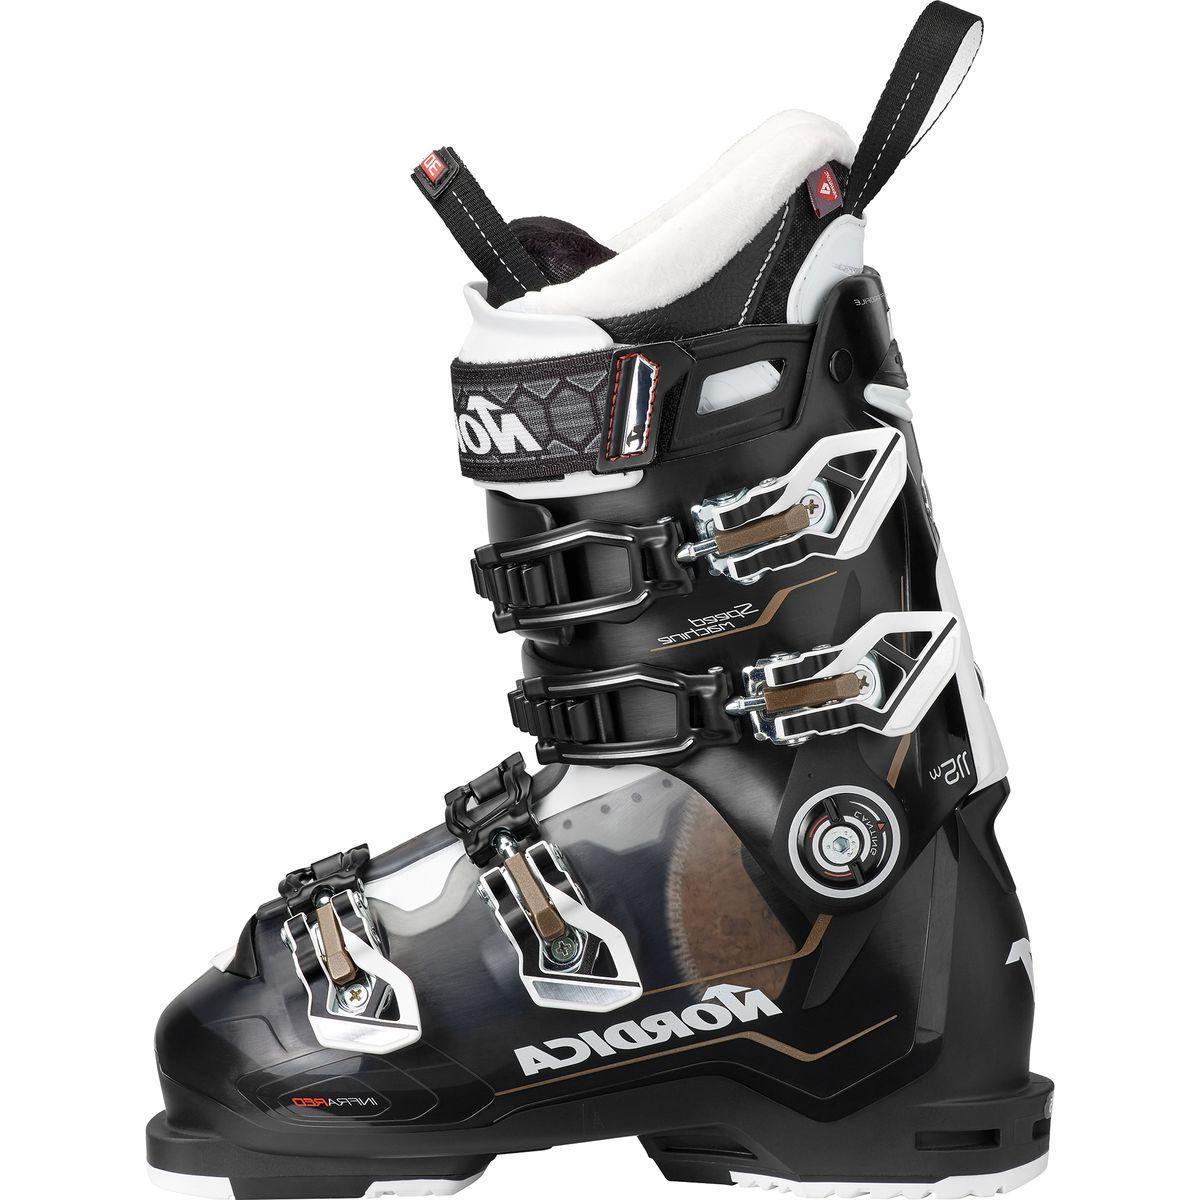 Nordica Speedmachine 115 Ski Boot - Women's